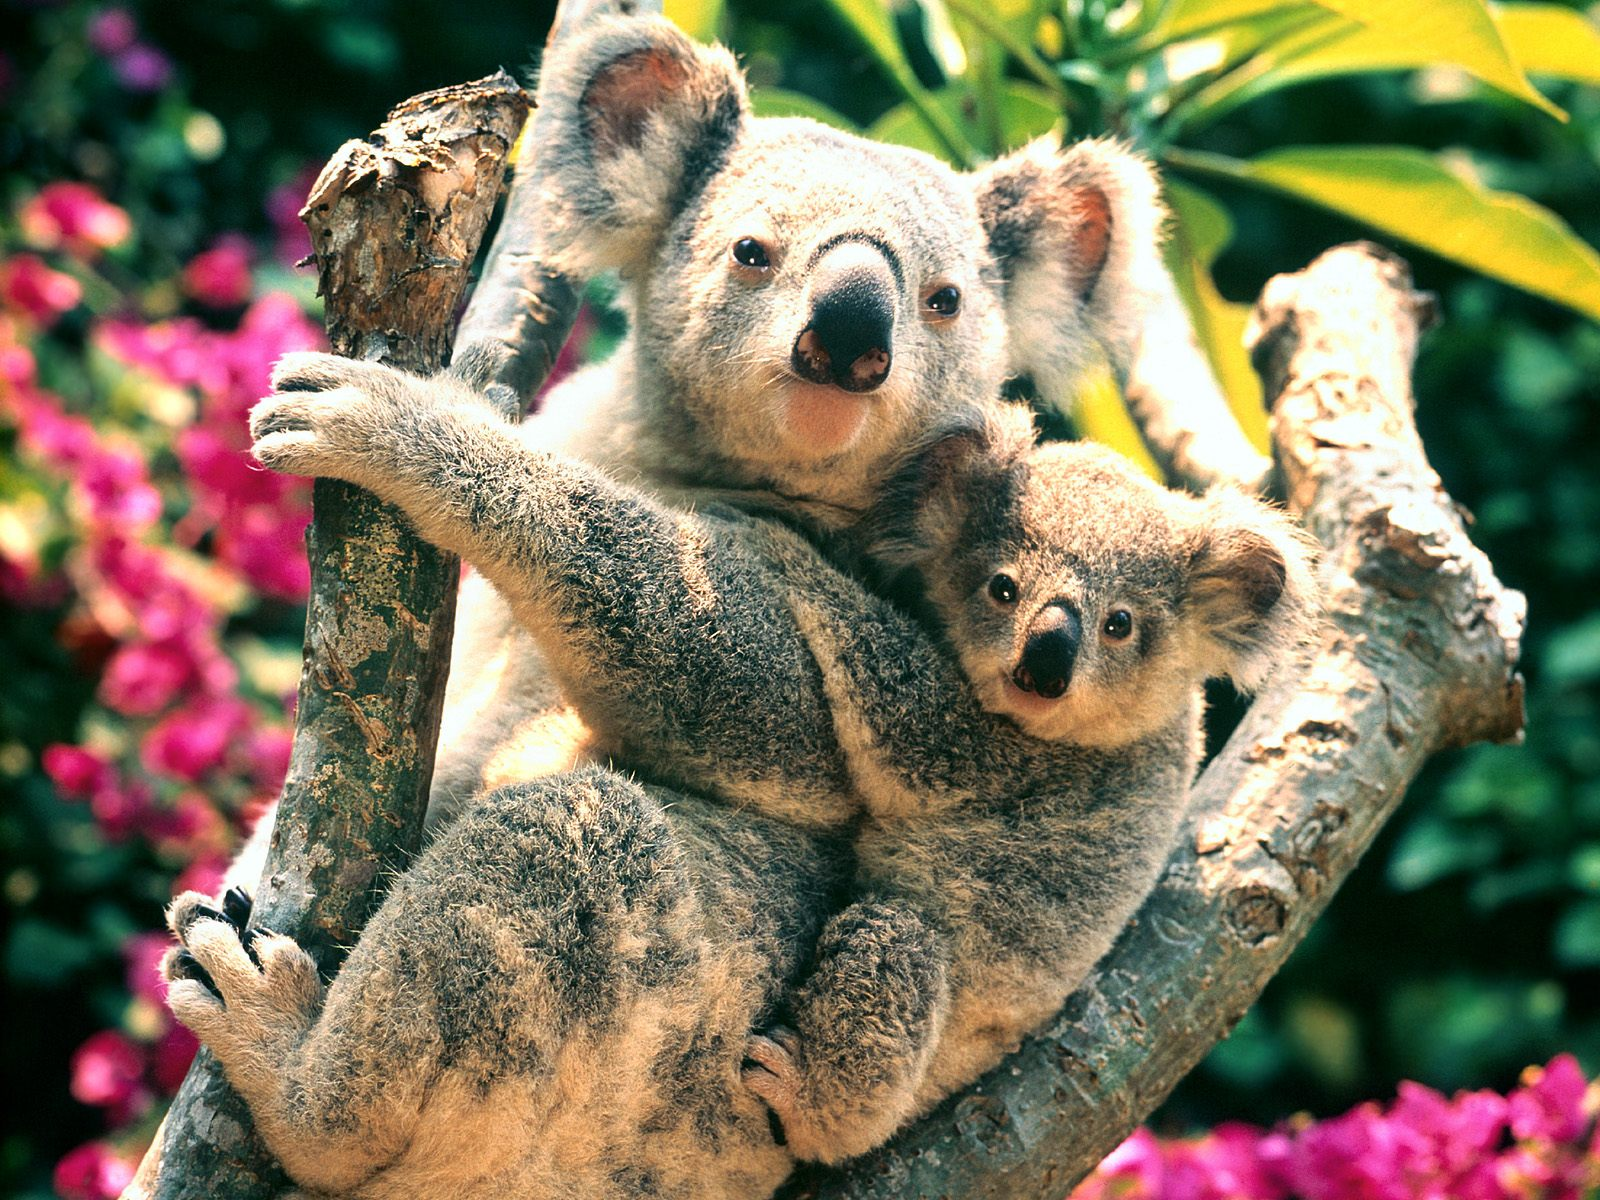 Tiere in australien hintergrundbild tiere in australien